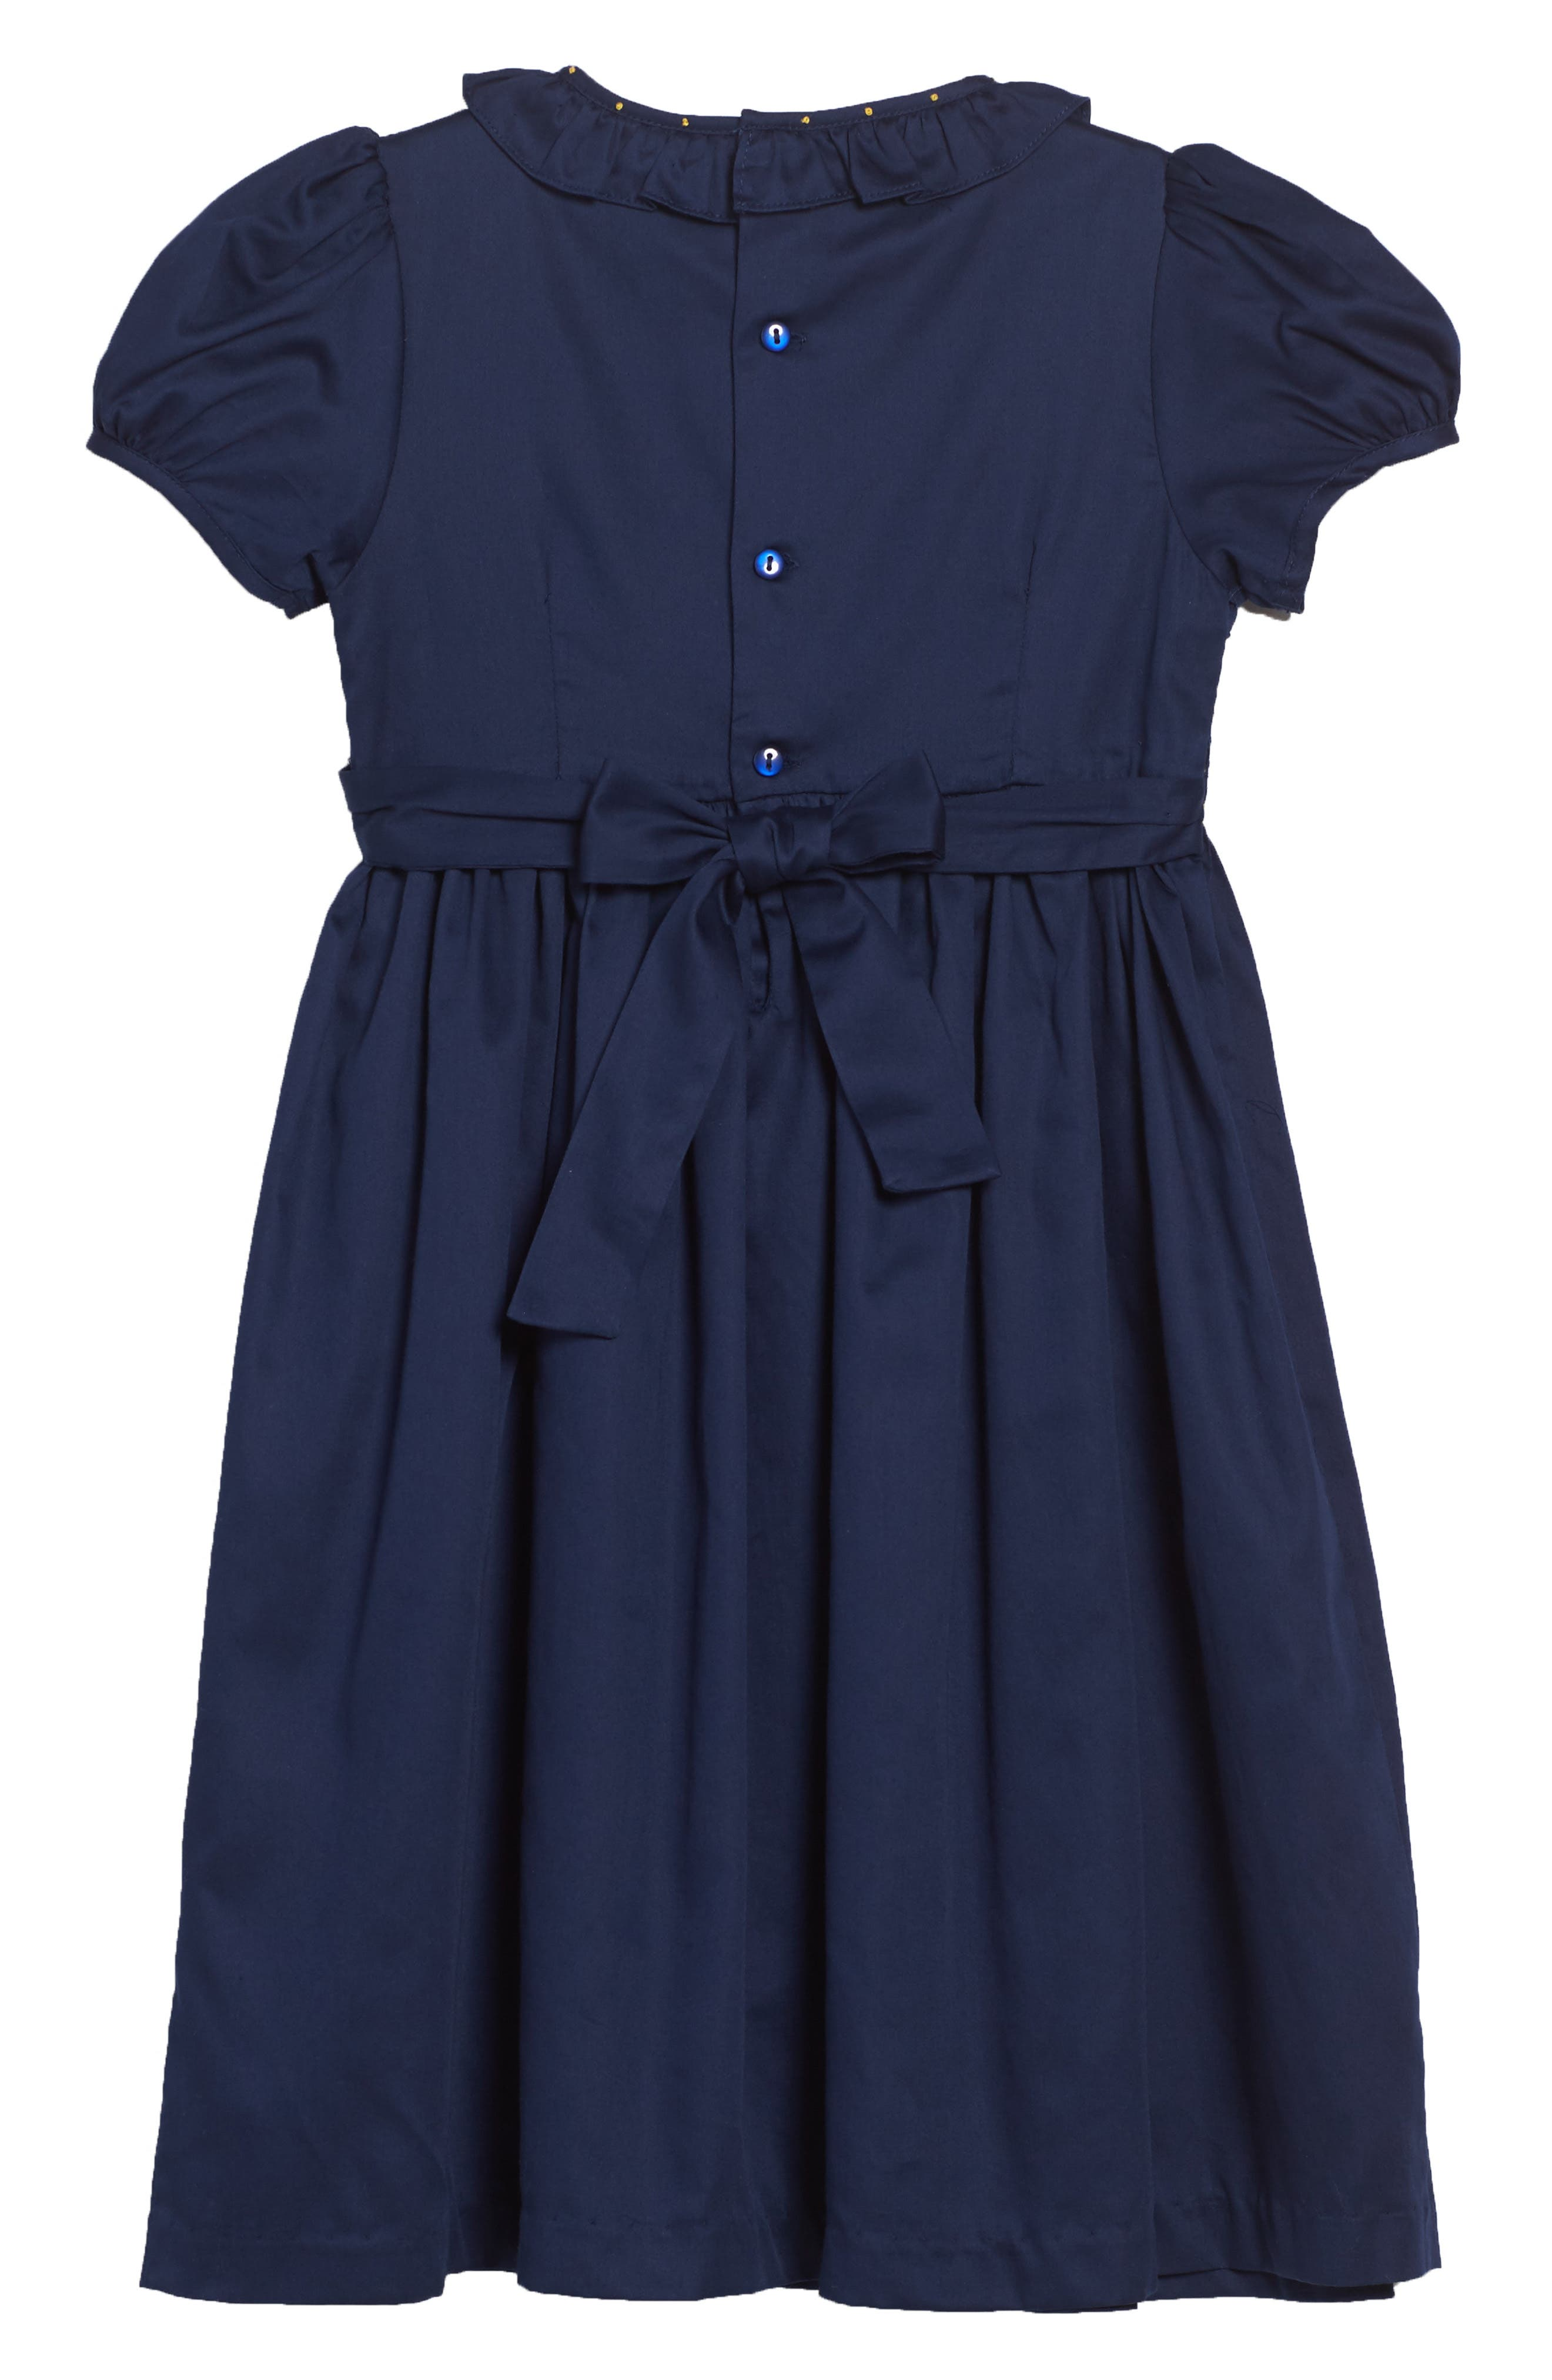 Smocked Dress,                             Alternate thumbnail 2, color,                             410